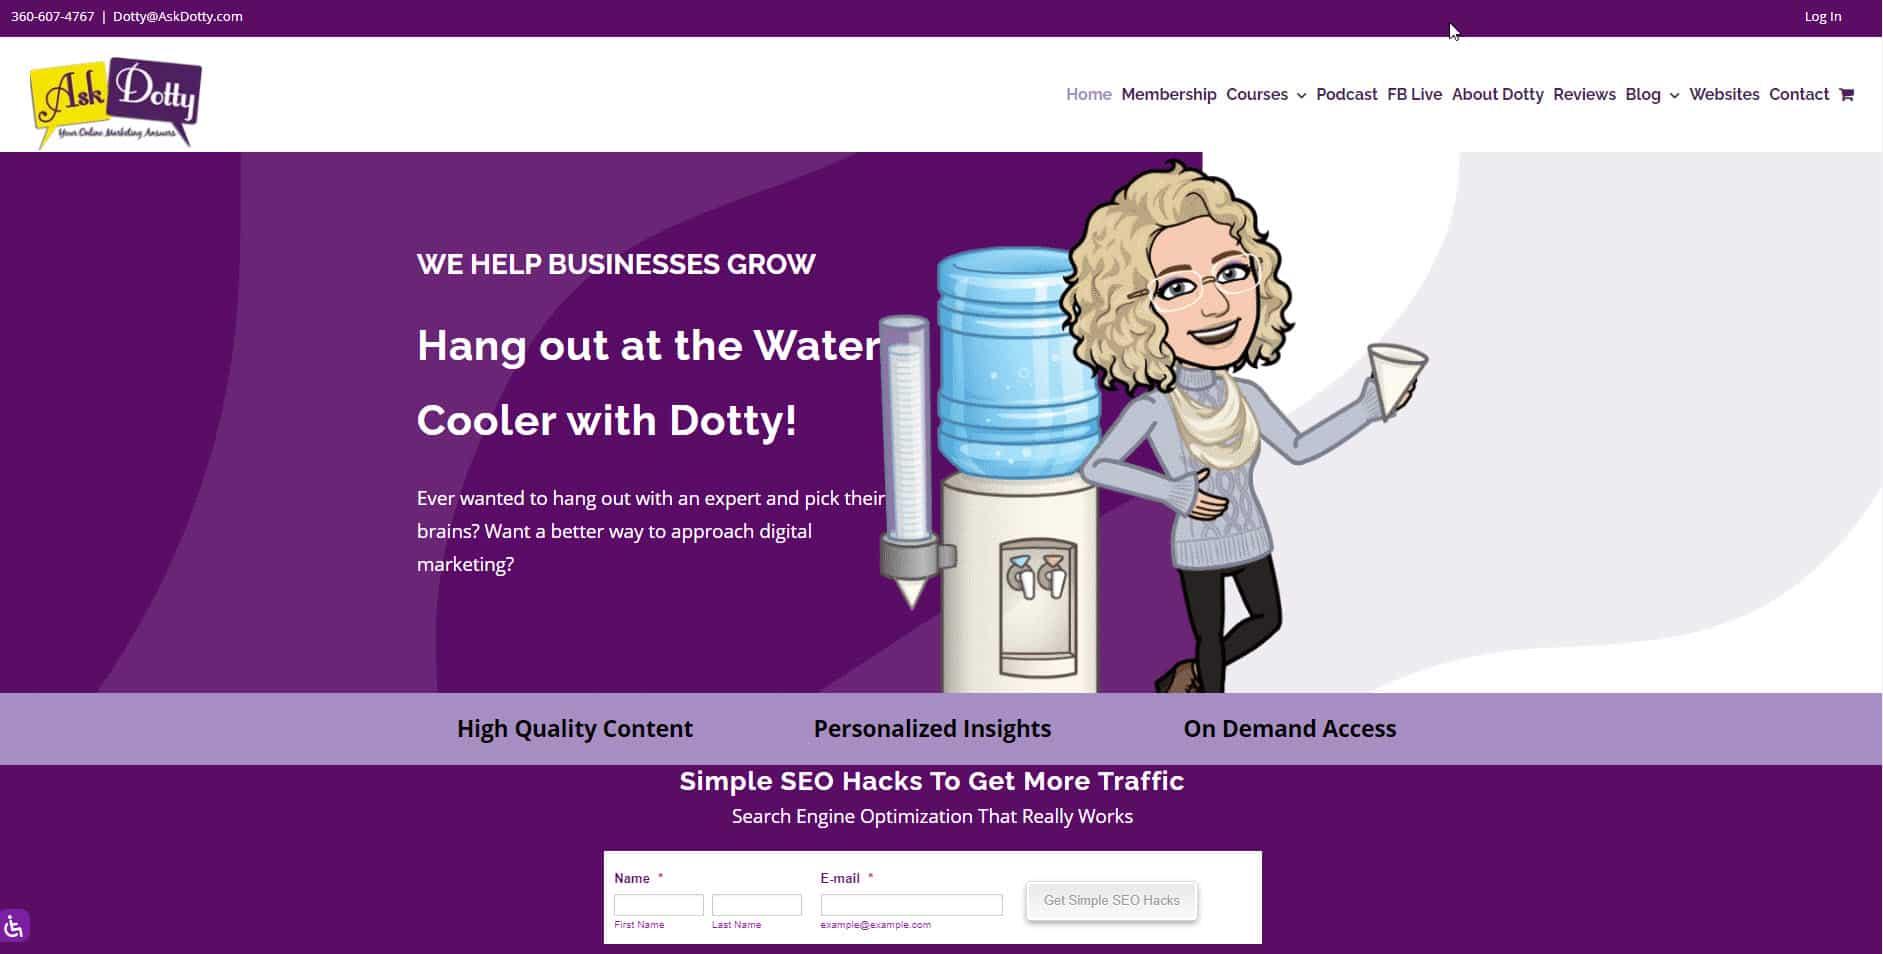 AskDotty - Digital Marketing Training